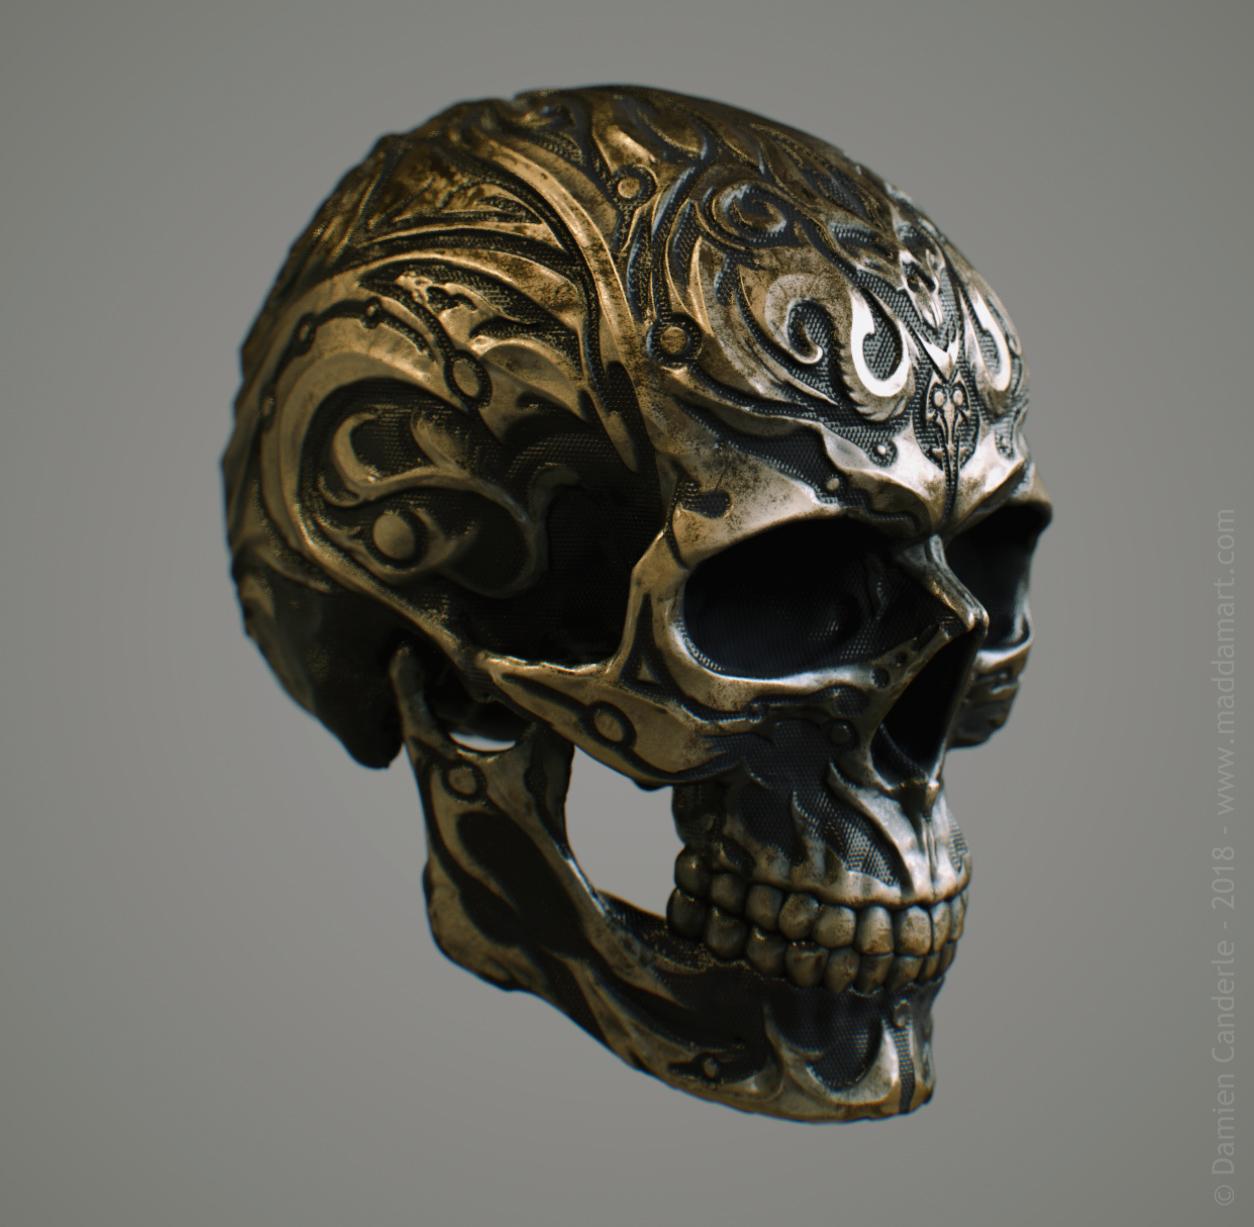 DamienCanderle_Skull_05i